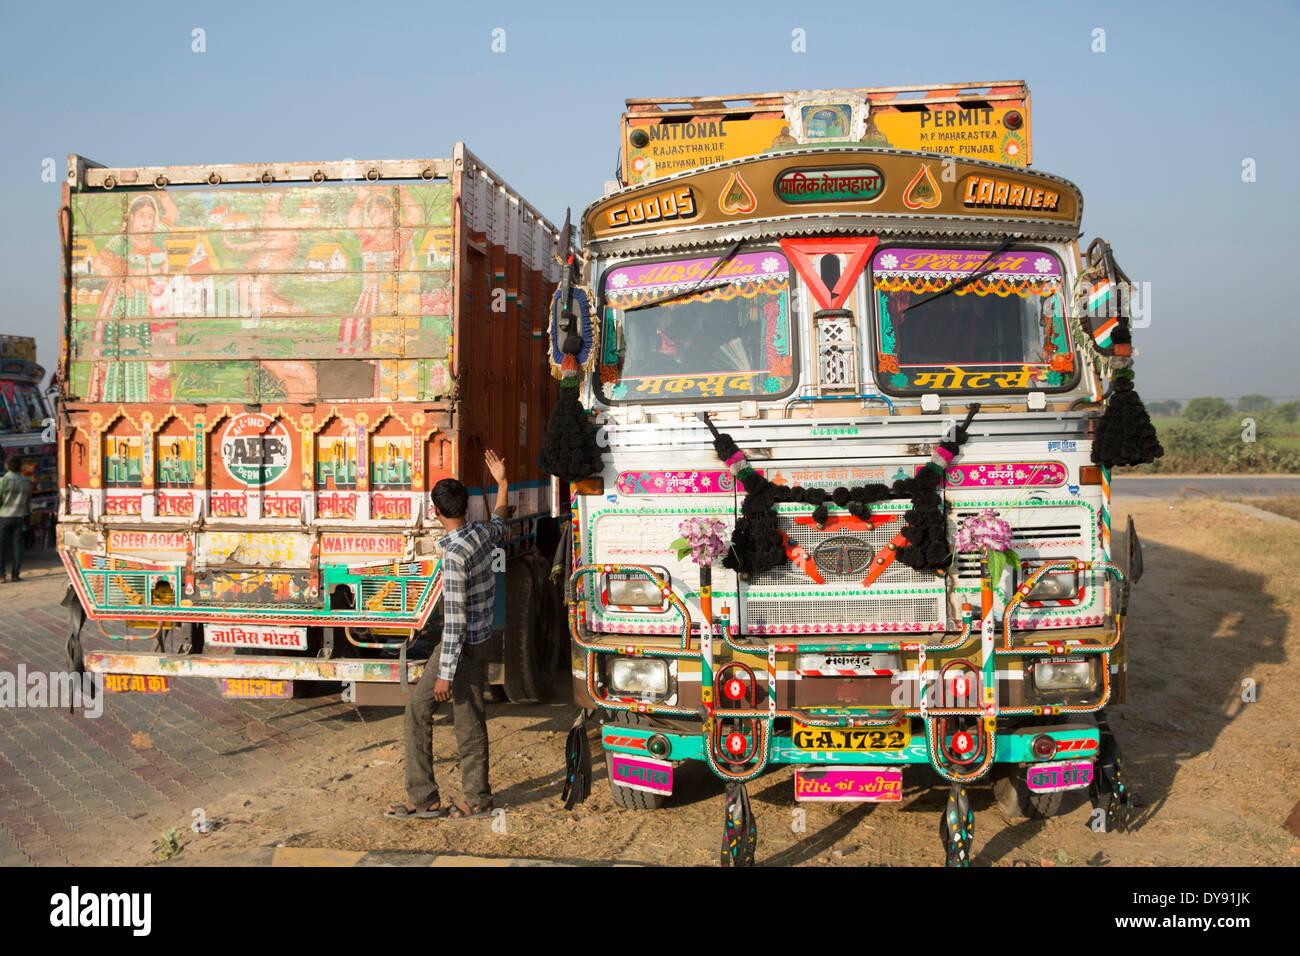 Indian, camion, Asia, India, traffico, trasporti, luminoso, Immagini Stock